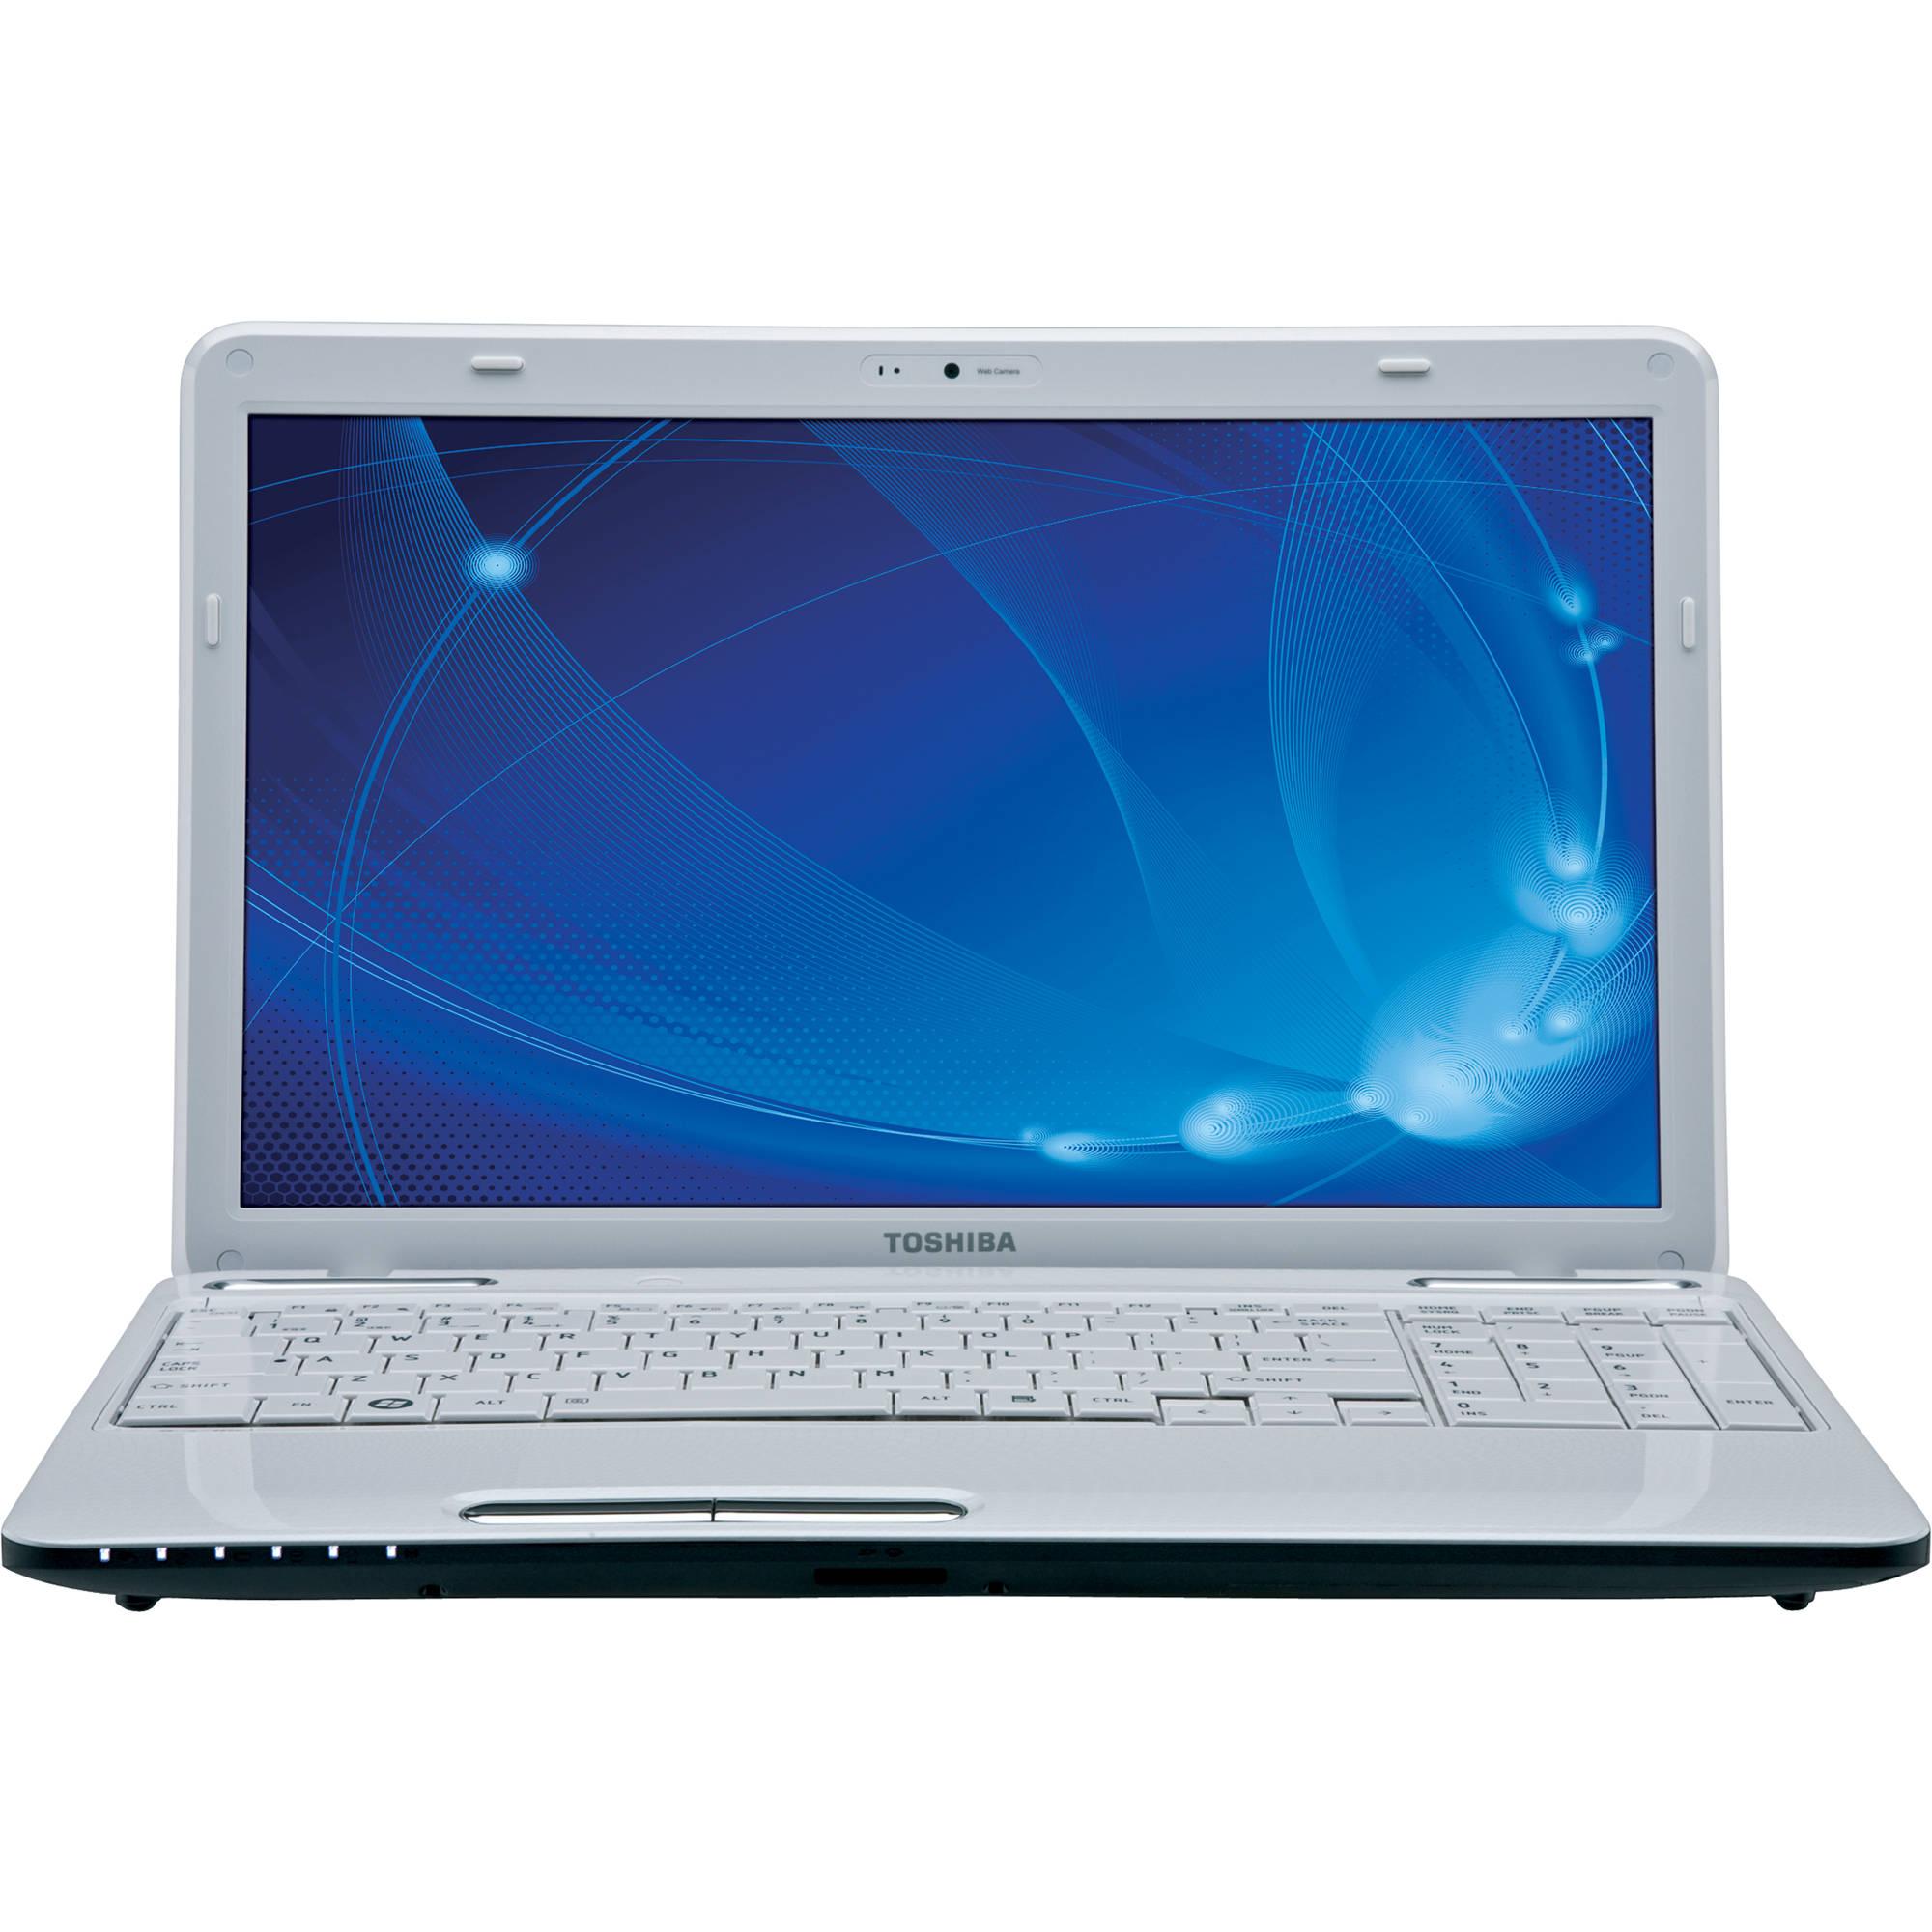 Toshiba Satellite T130 HDD/SSD Alert Windows Vista 64-BIT